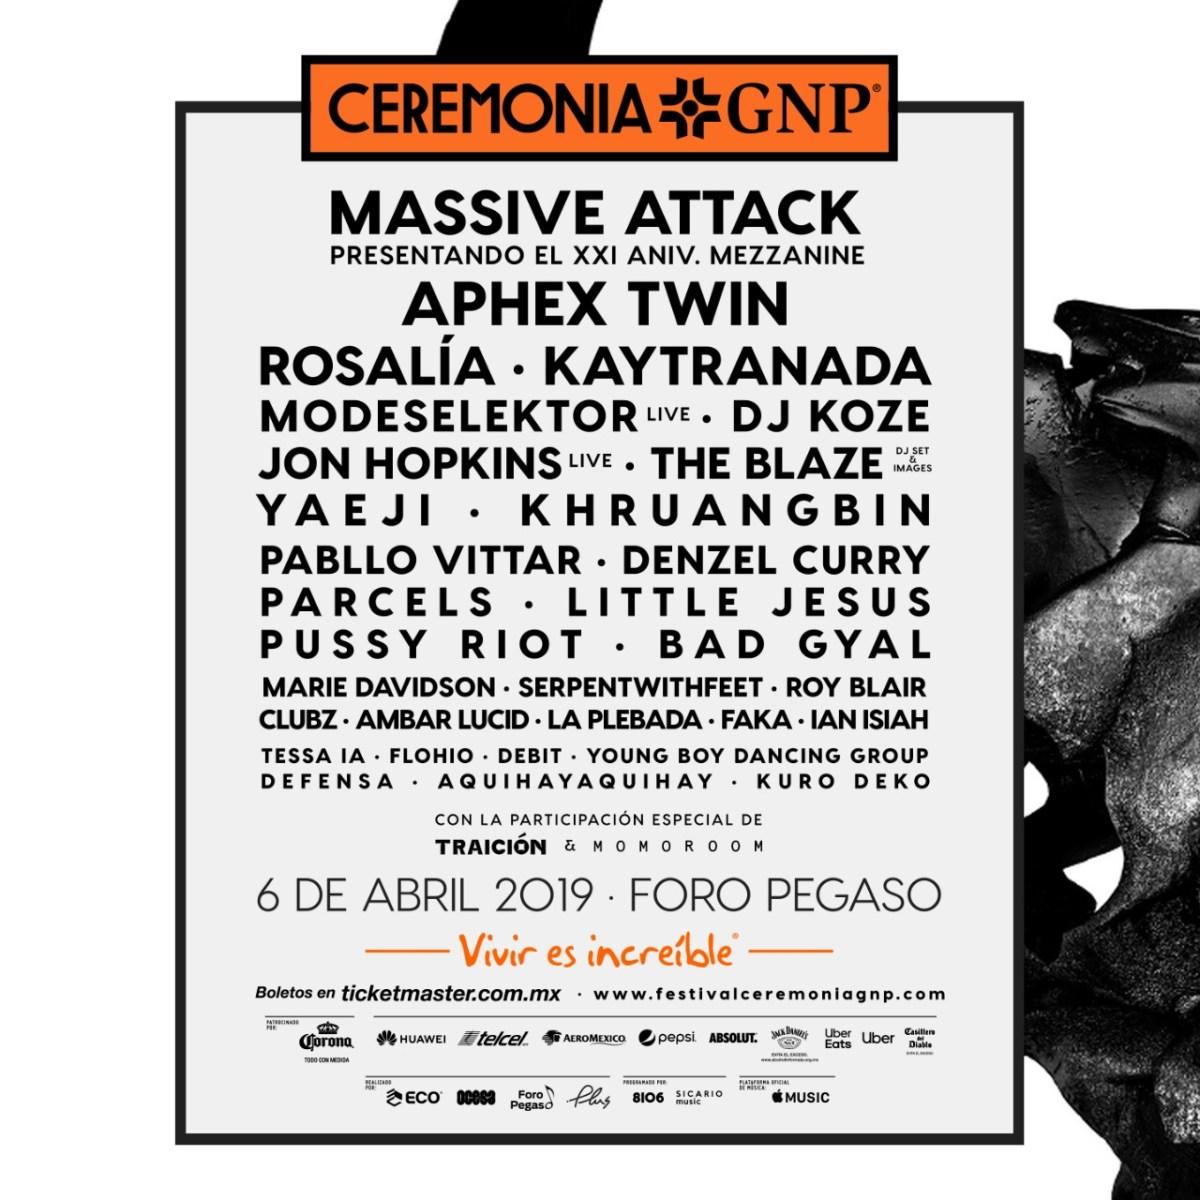 Massive Attack luce en el cartel del próximo Ceremonia donde va a tocar completo el Mezzanine.